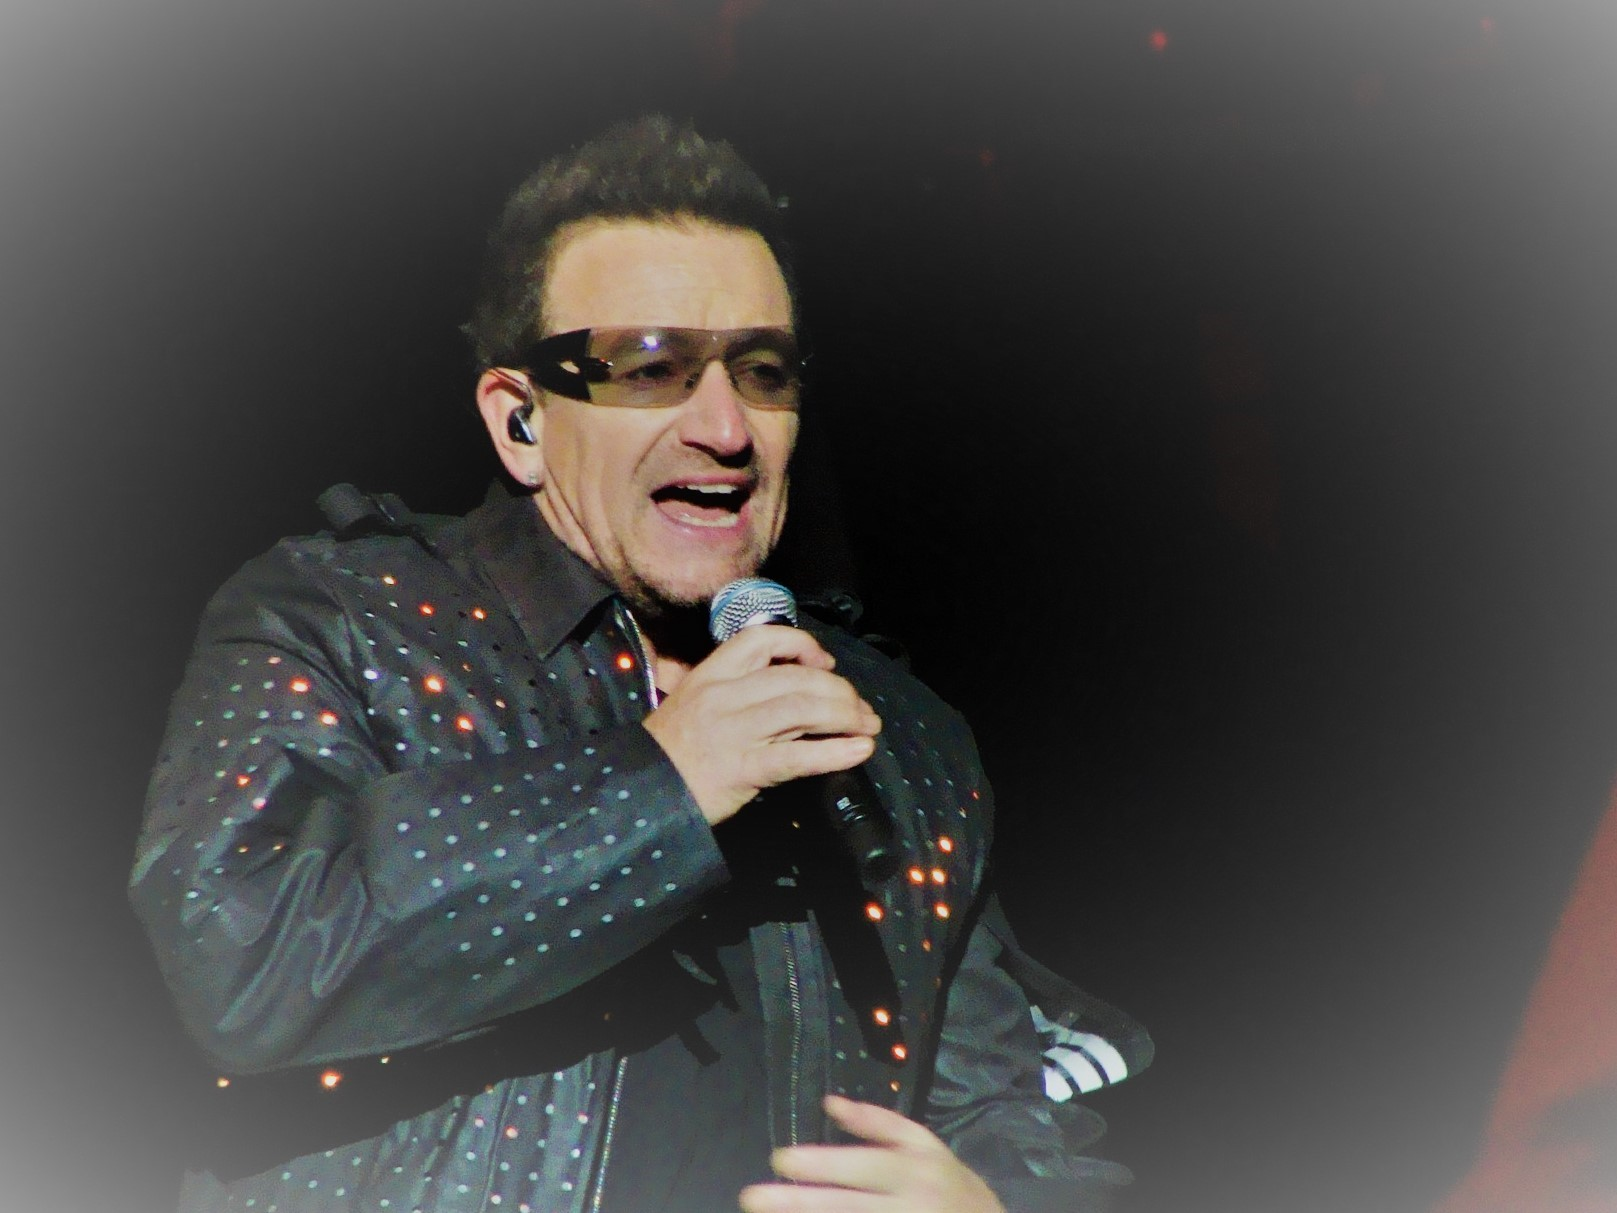 https://www.lone-star.com/wp-content/uploads/2017/05/Bono.jpg